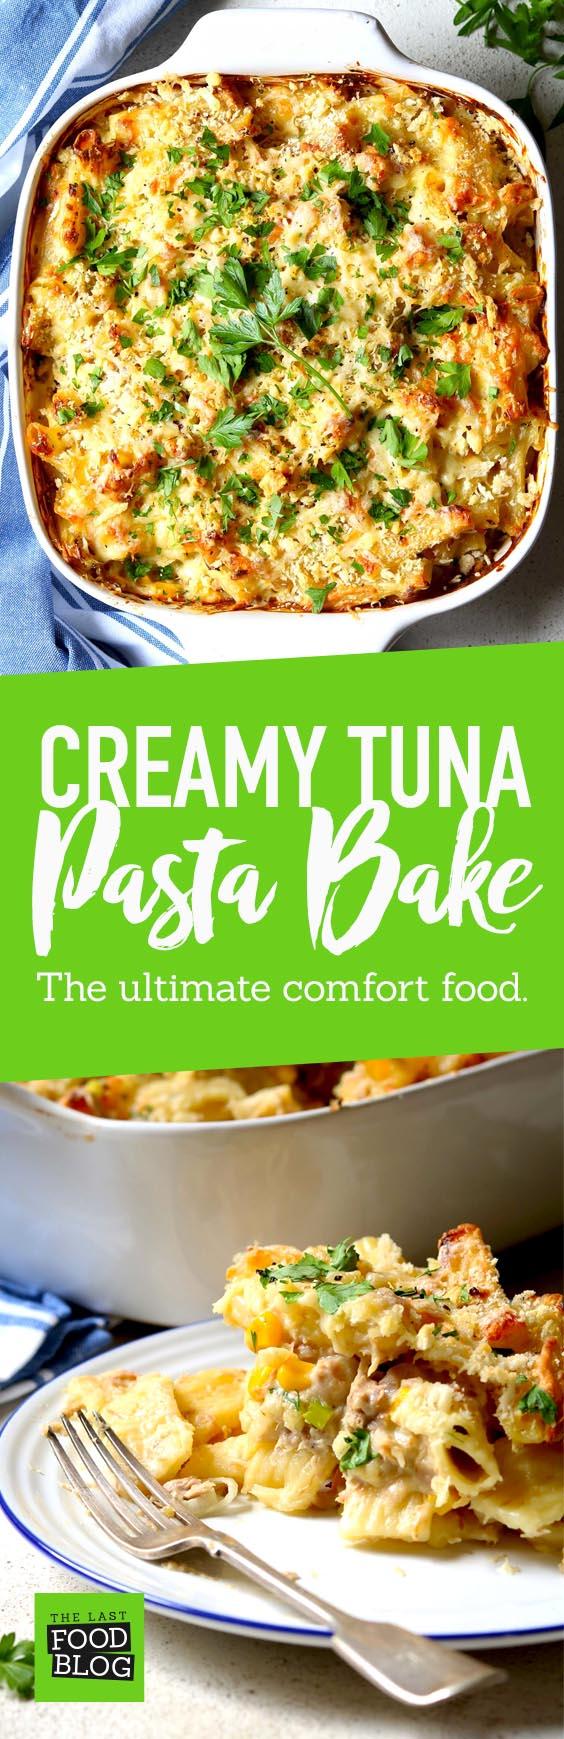 Creamy Tuna Pasta Bake - thelastfoodblog.com